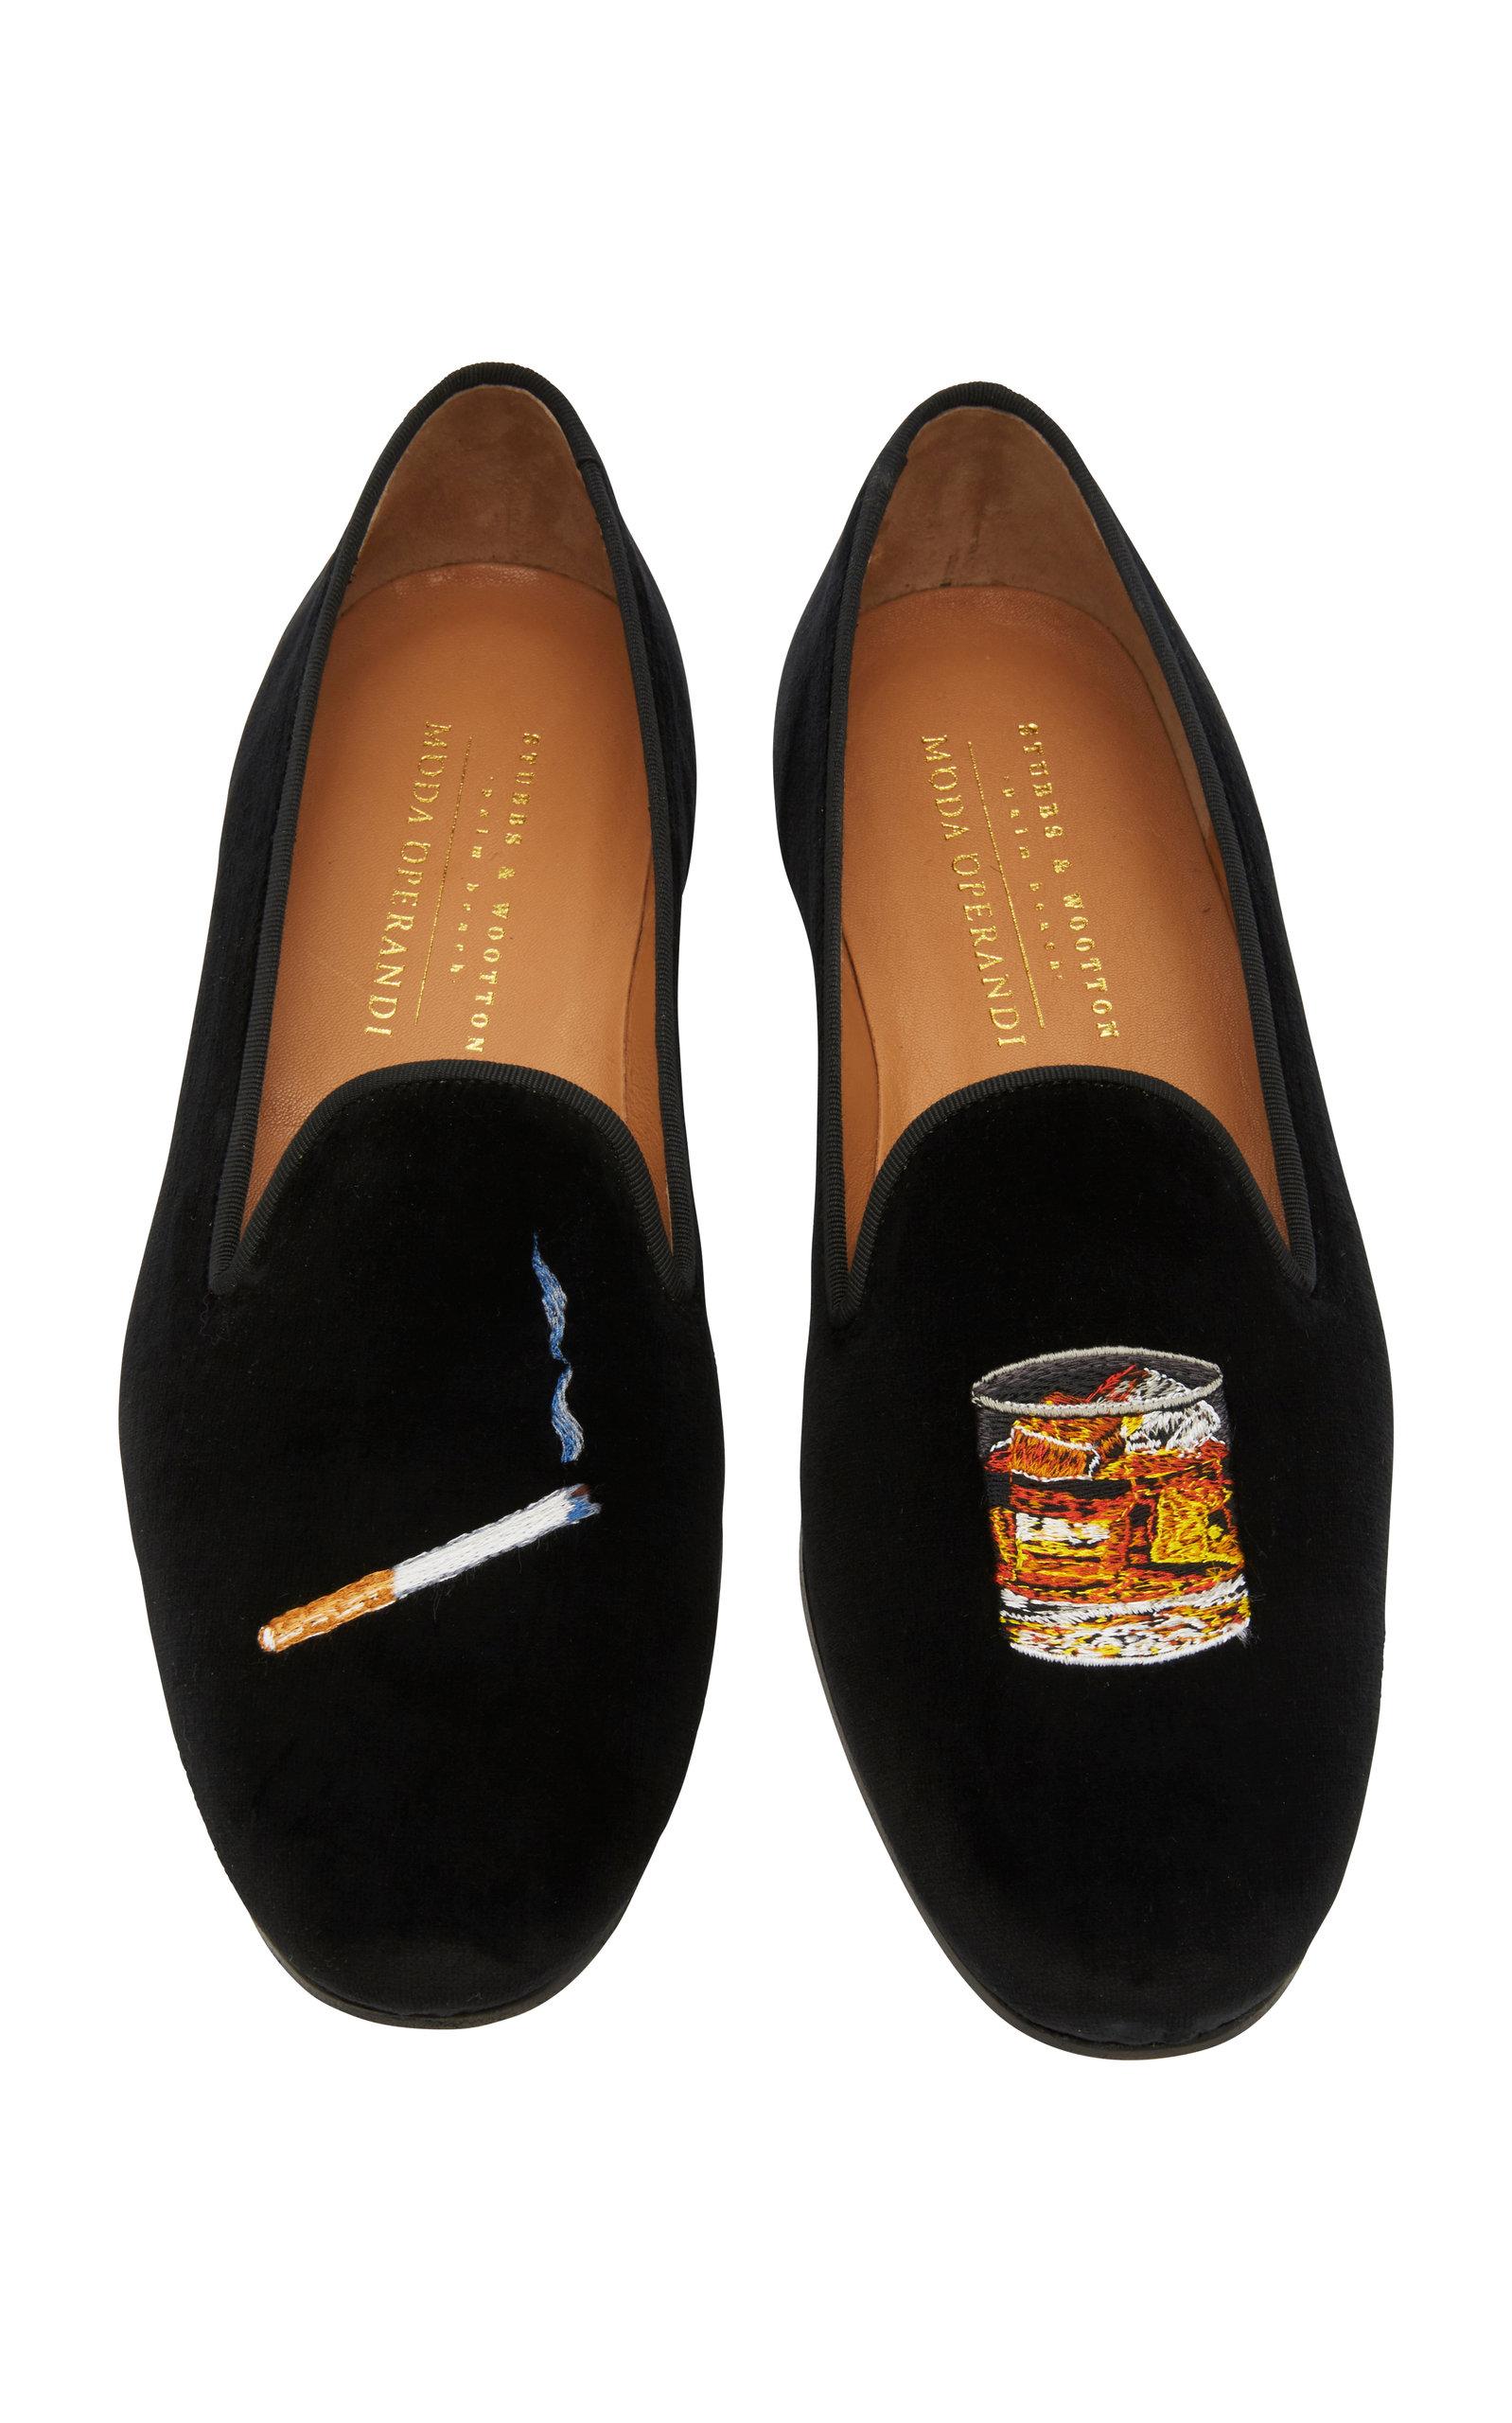 2d3e6712f Stubbs & WoottonExclusive Cigarette and Scotch Velvet Slippers. CLOSE.  Loading